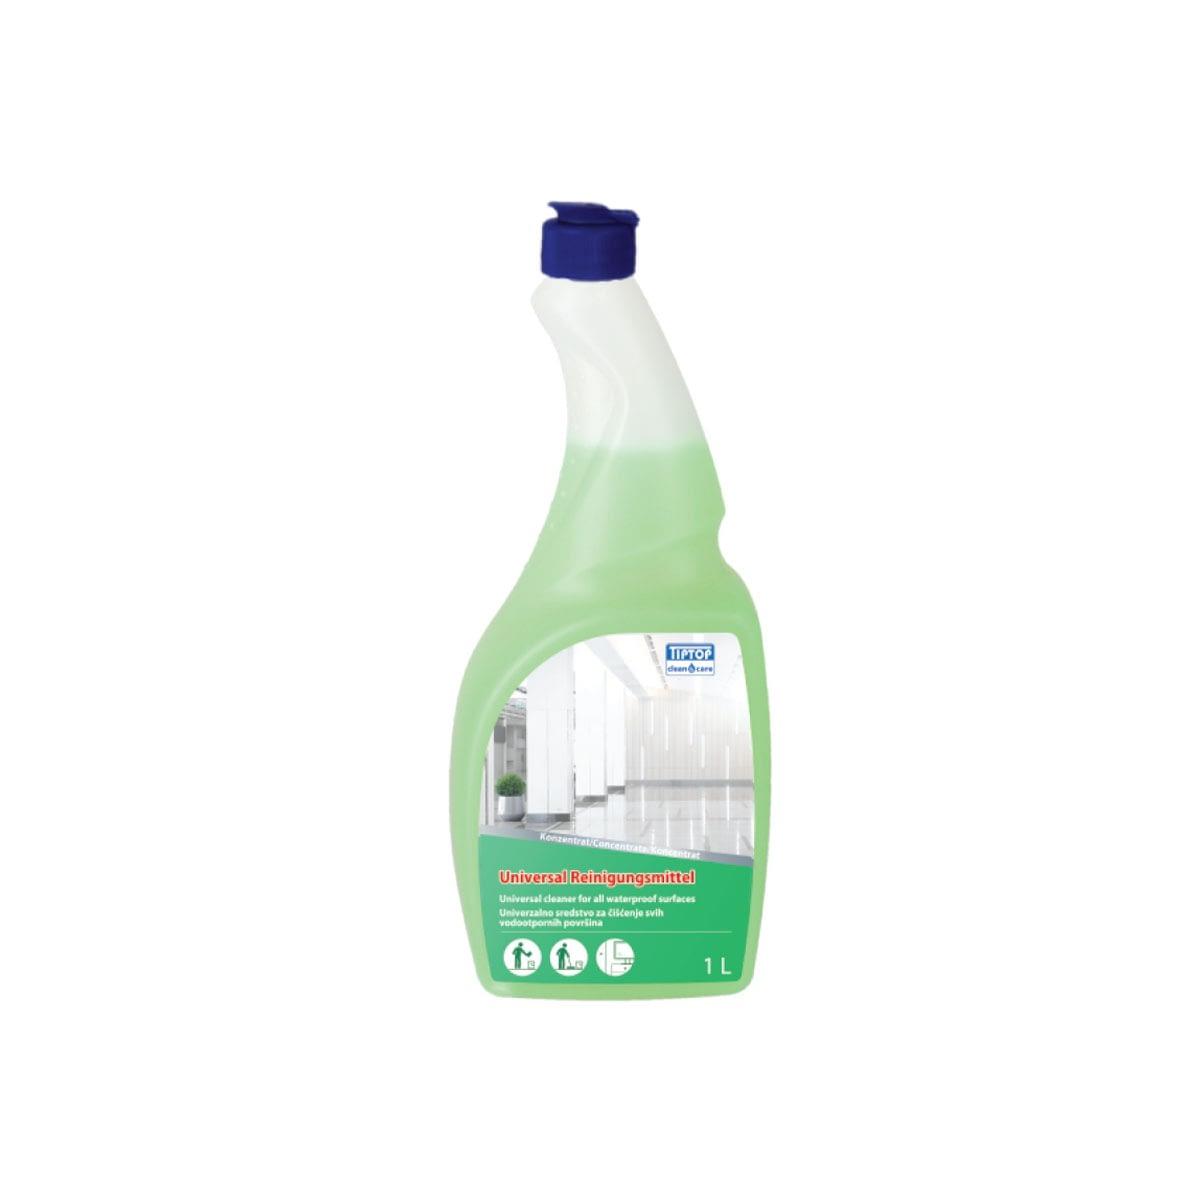 TTC Univerzalno sredstvo za čišćenje svih vrsta vodootpornih površina. Koncetrovano. 1L